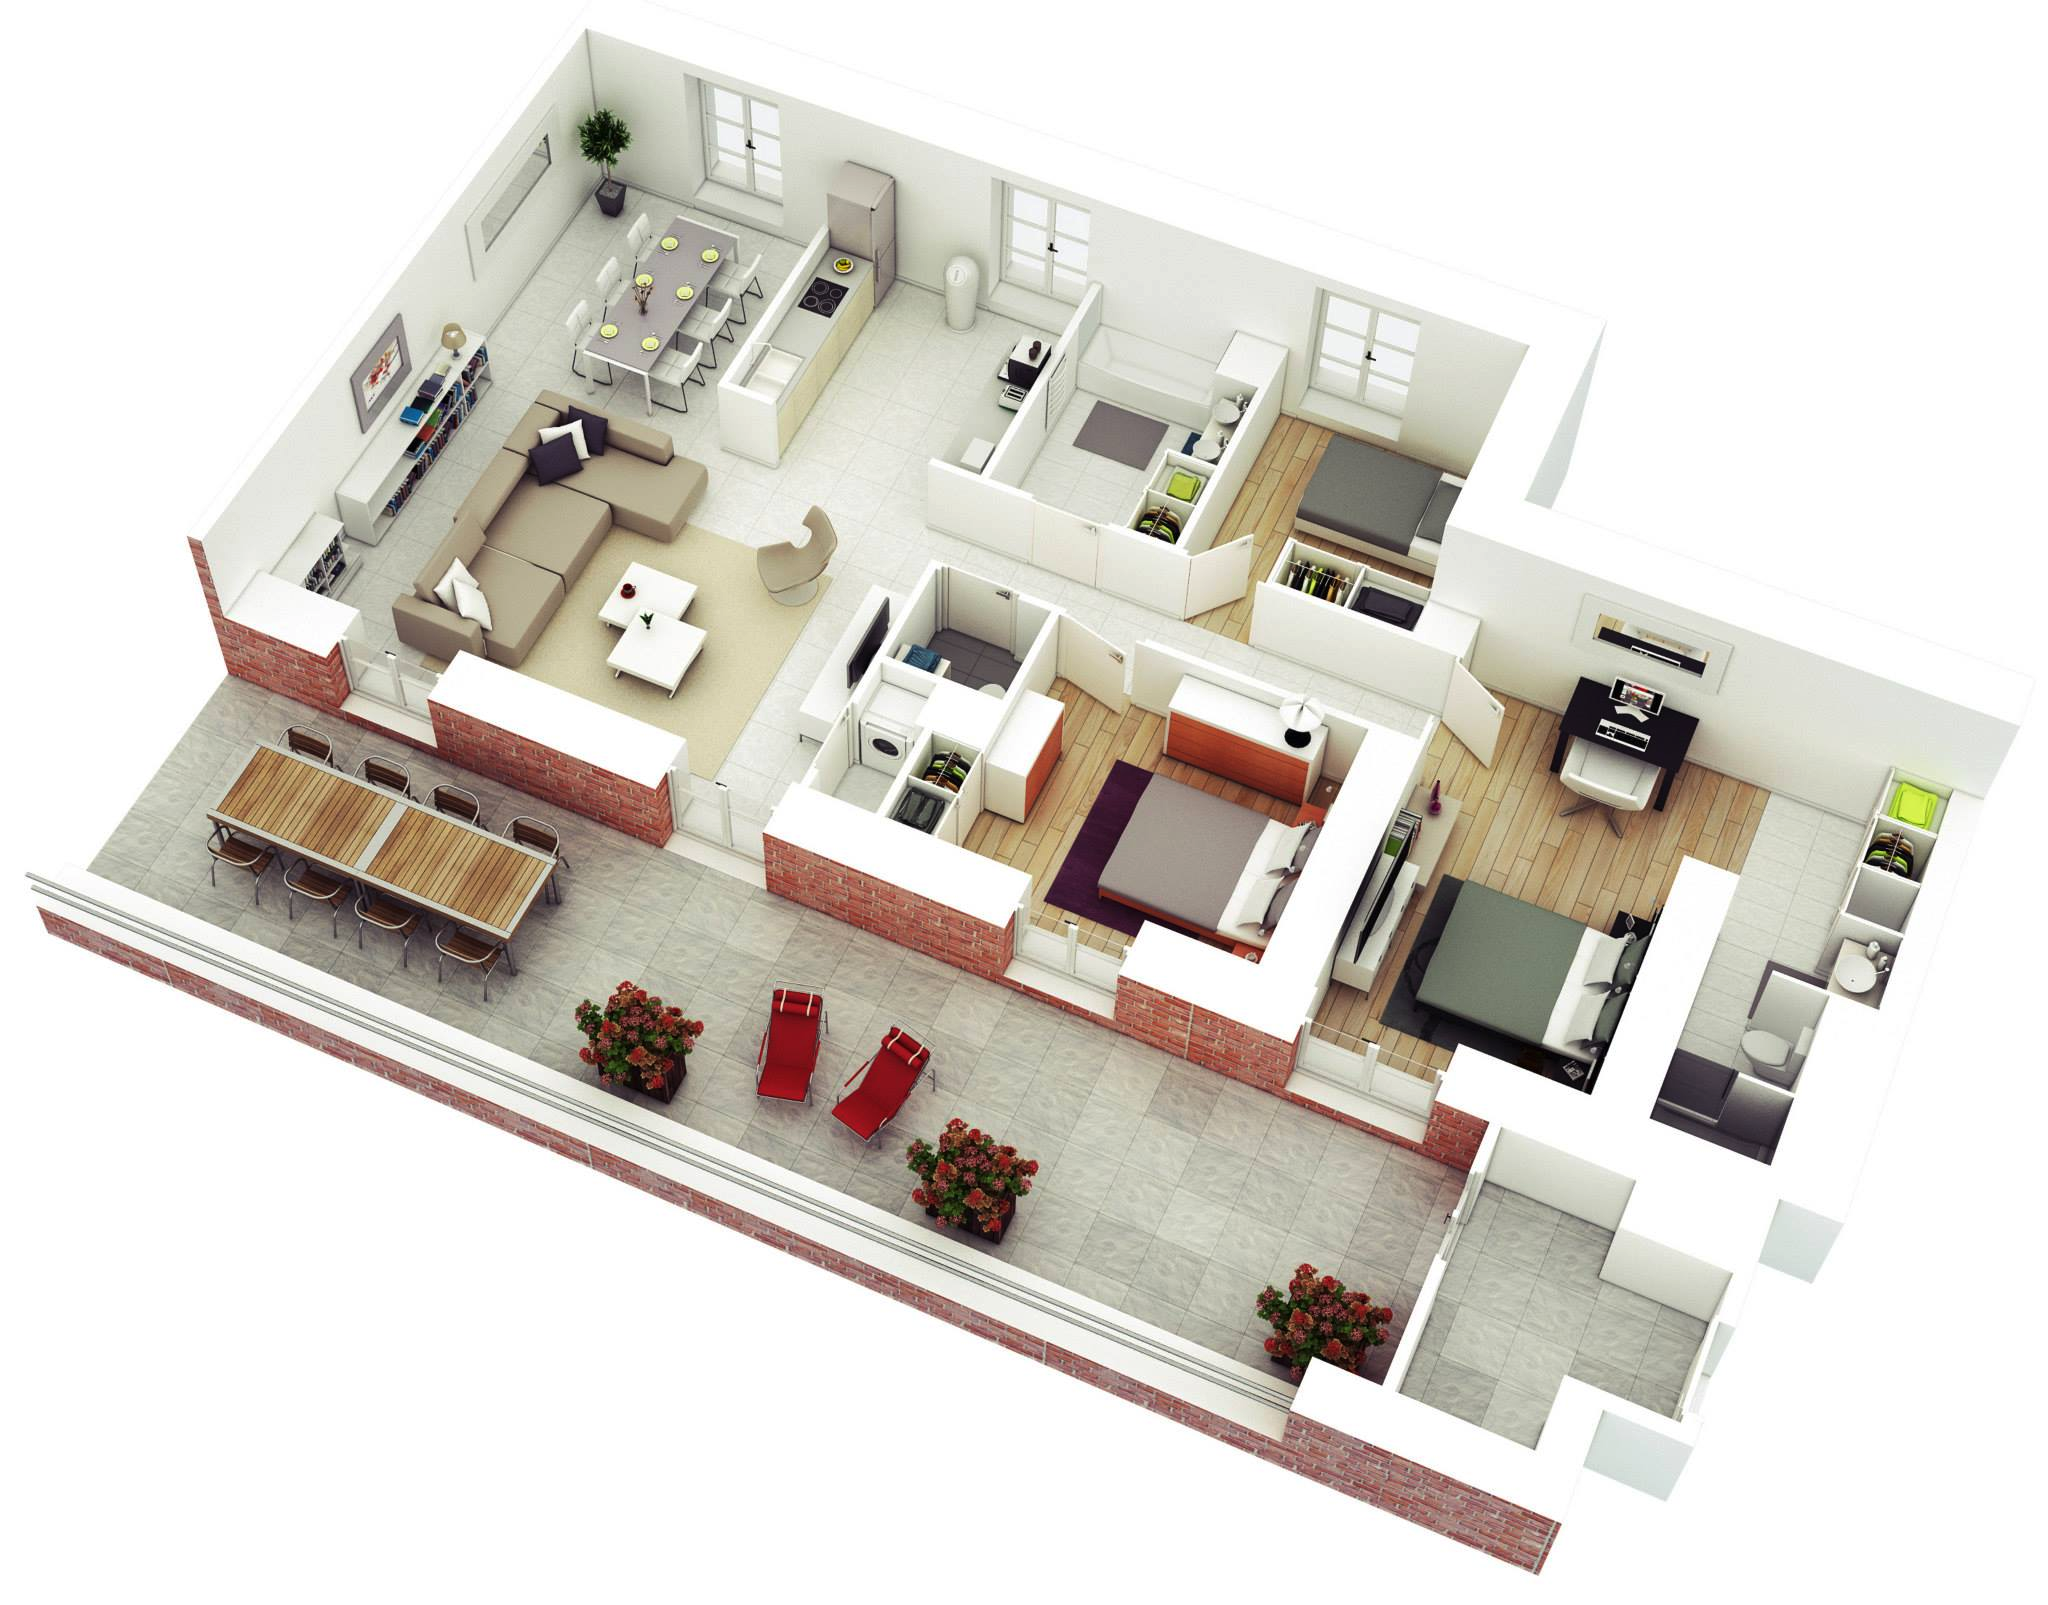 25 More 3 Bedroom 3D Floor Plans | 3d house plans, Modern ...